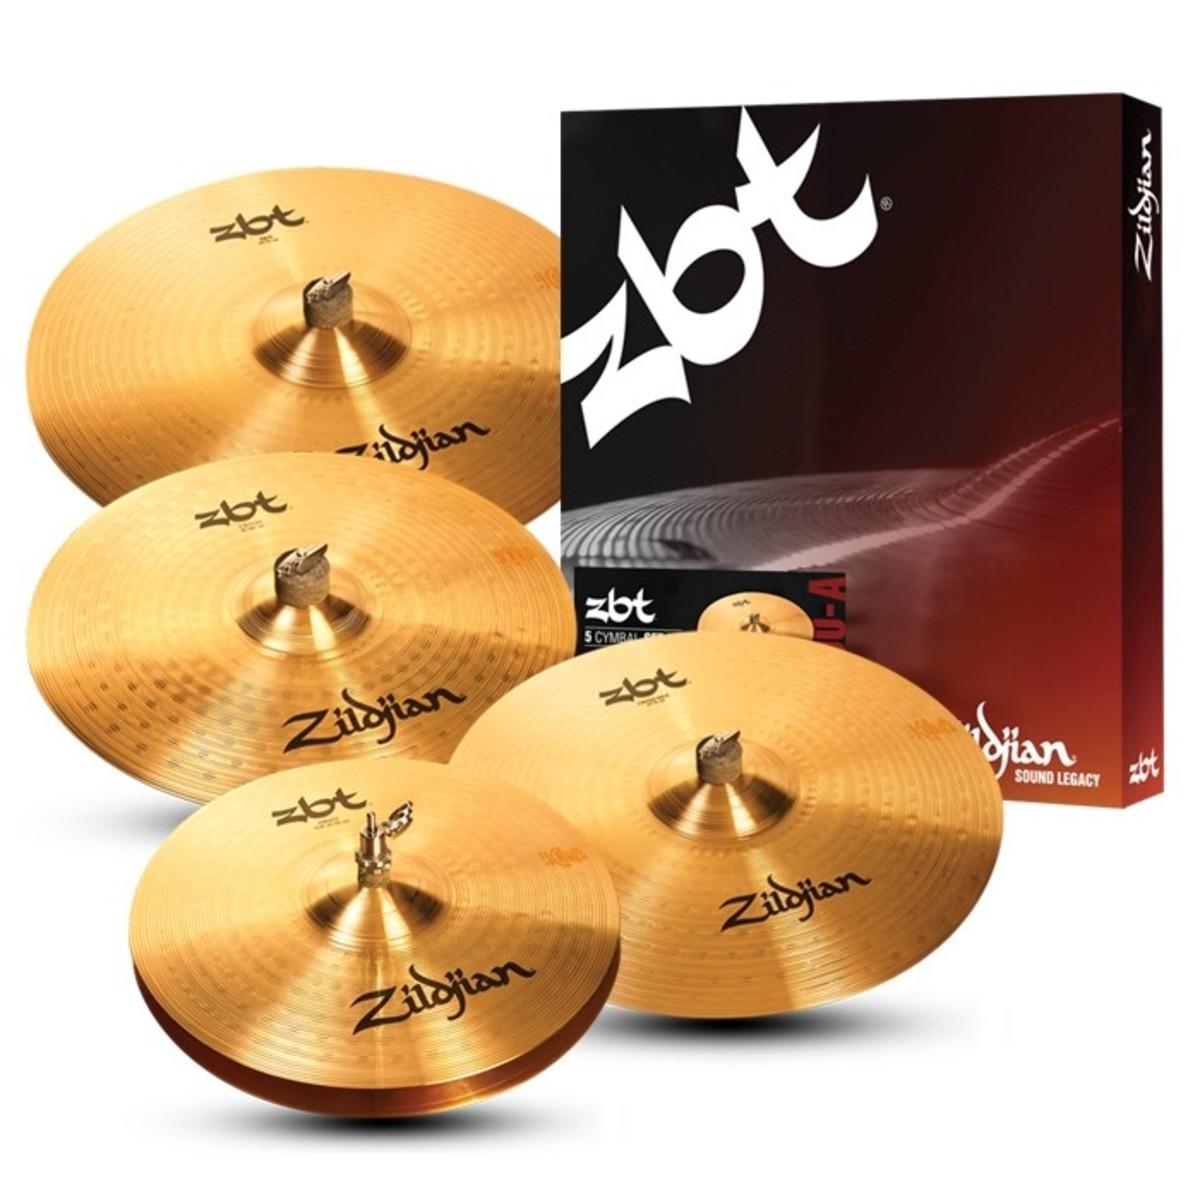 aebeac78d467 Zildjian ZBT Pro Box Set with FREE 18   Crash Cymbal - Ex Demo at Gear4music